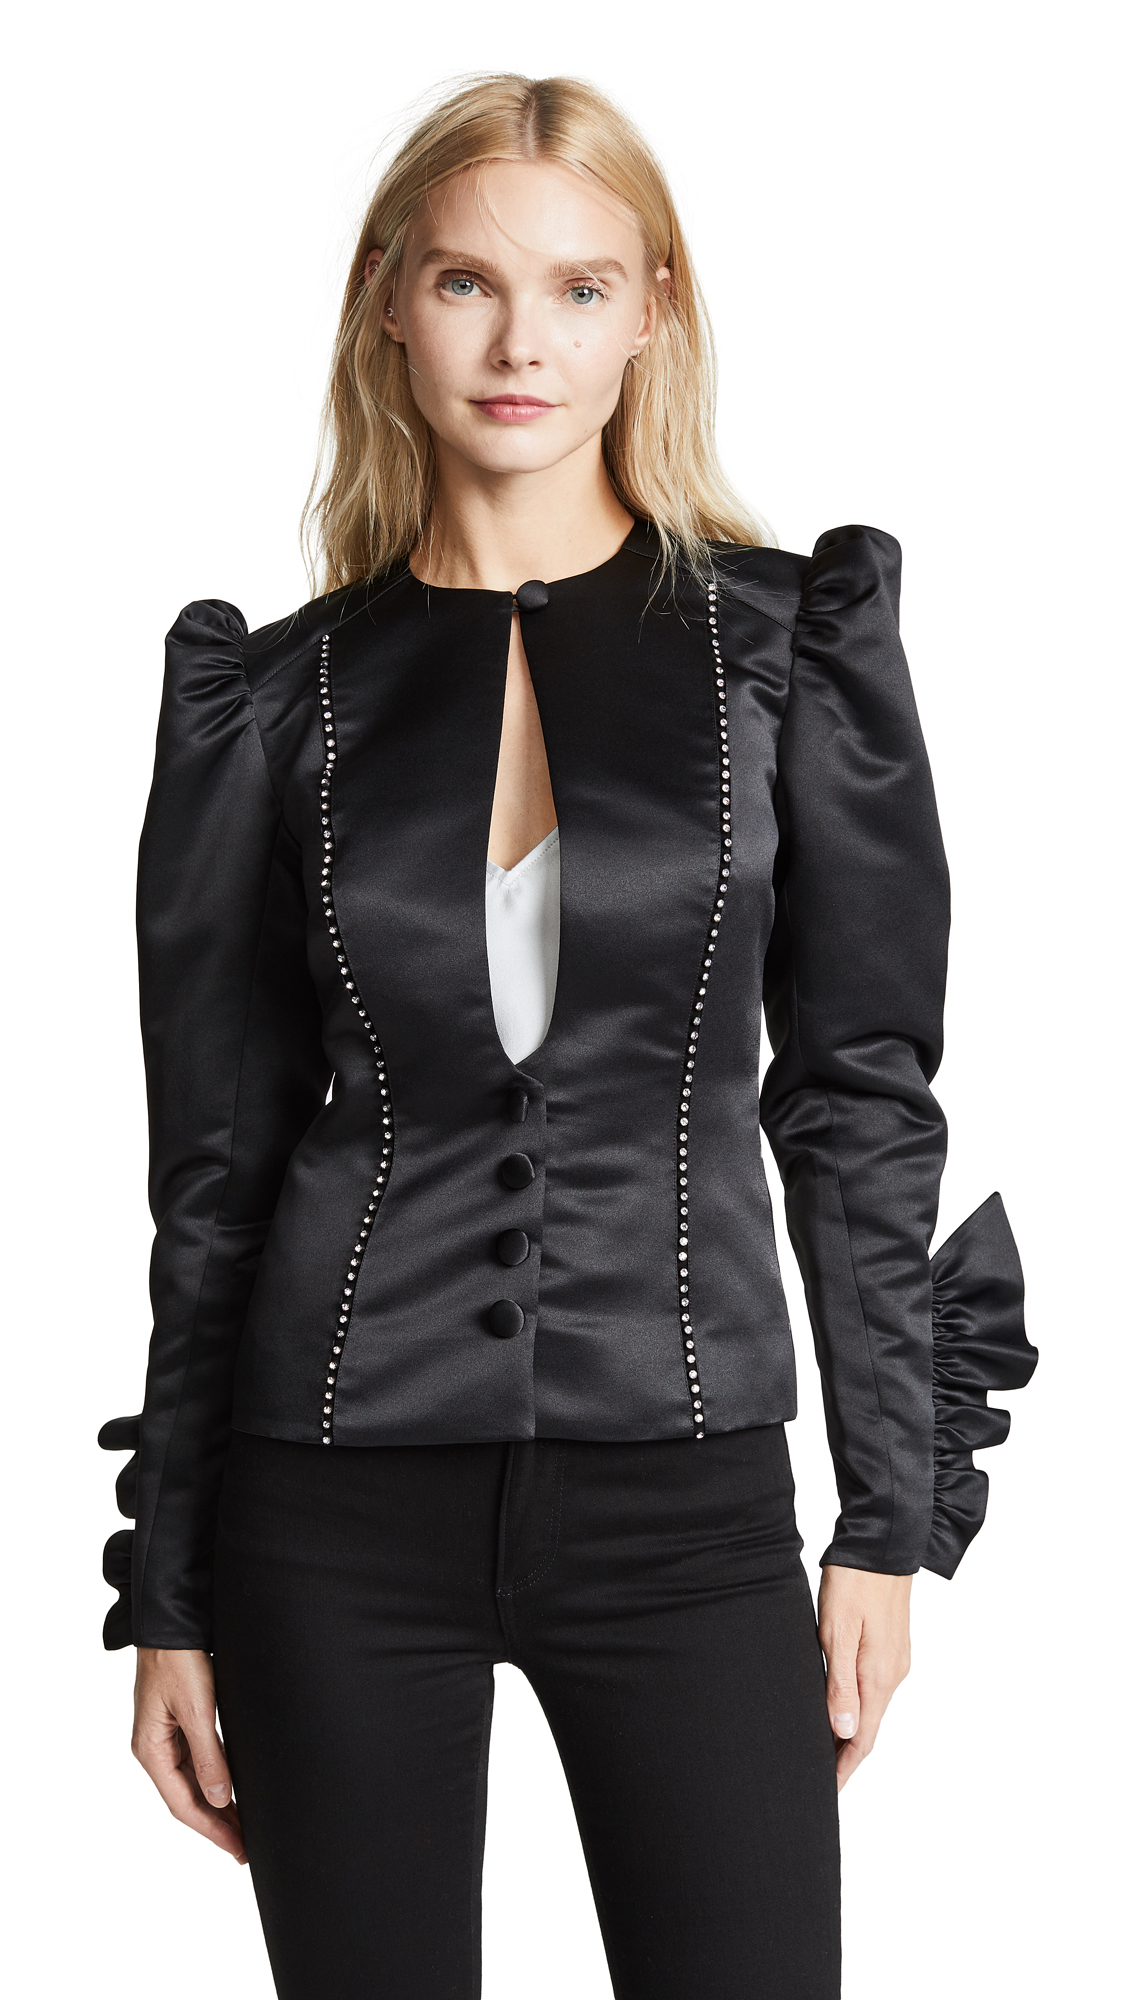 MARIANNA SENCHINA Jacket With Crystal Inserts in Black